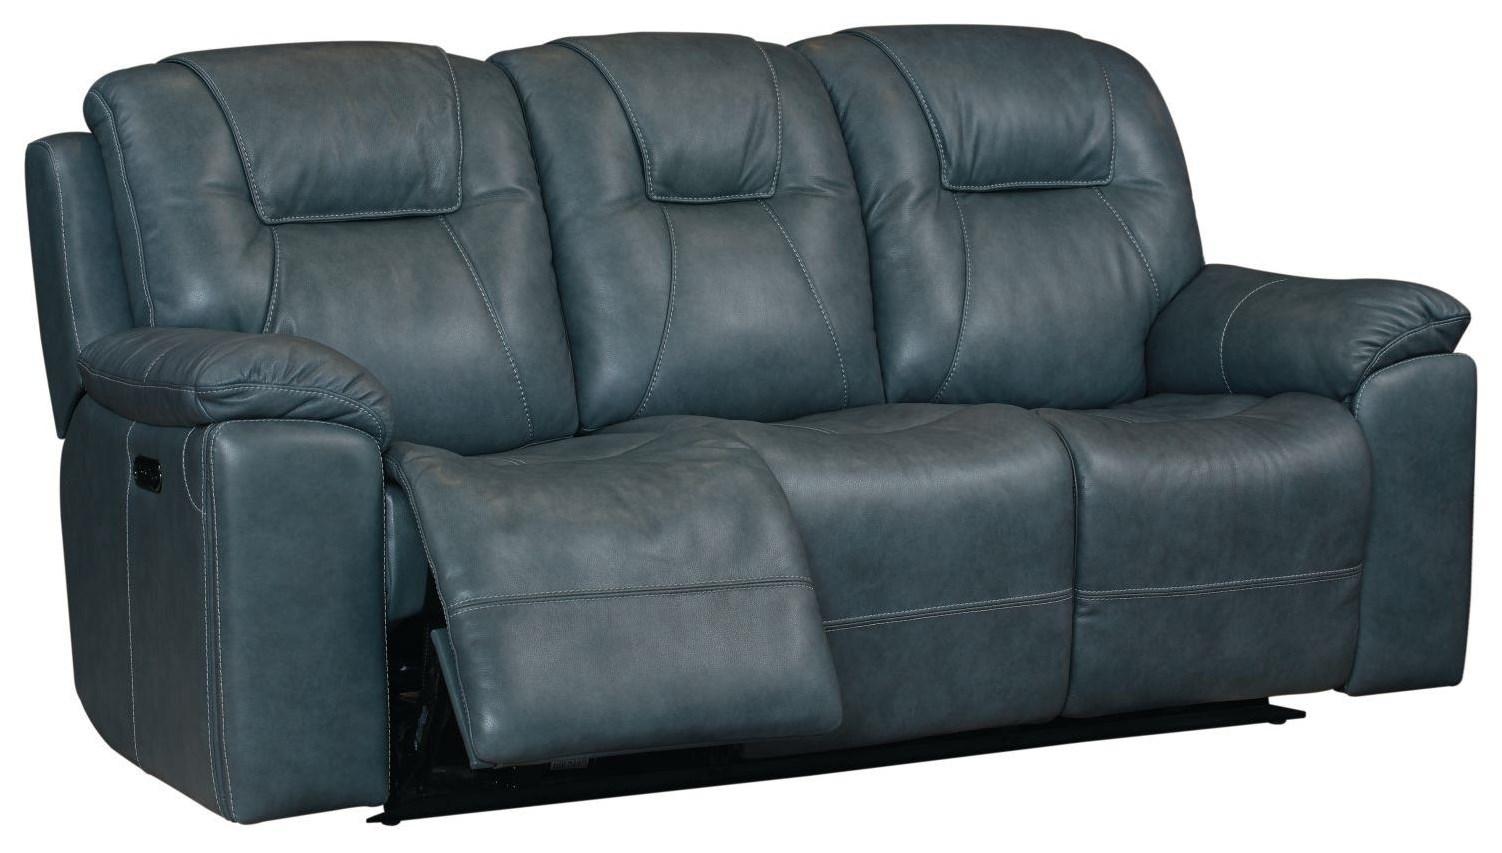 Picture of: Bassett Club Level Chandler 3739 P62b Power Reclining 3 Seat Sofa Esprit Decor Home Furnishings Reclining Sofas